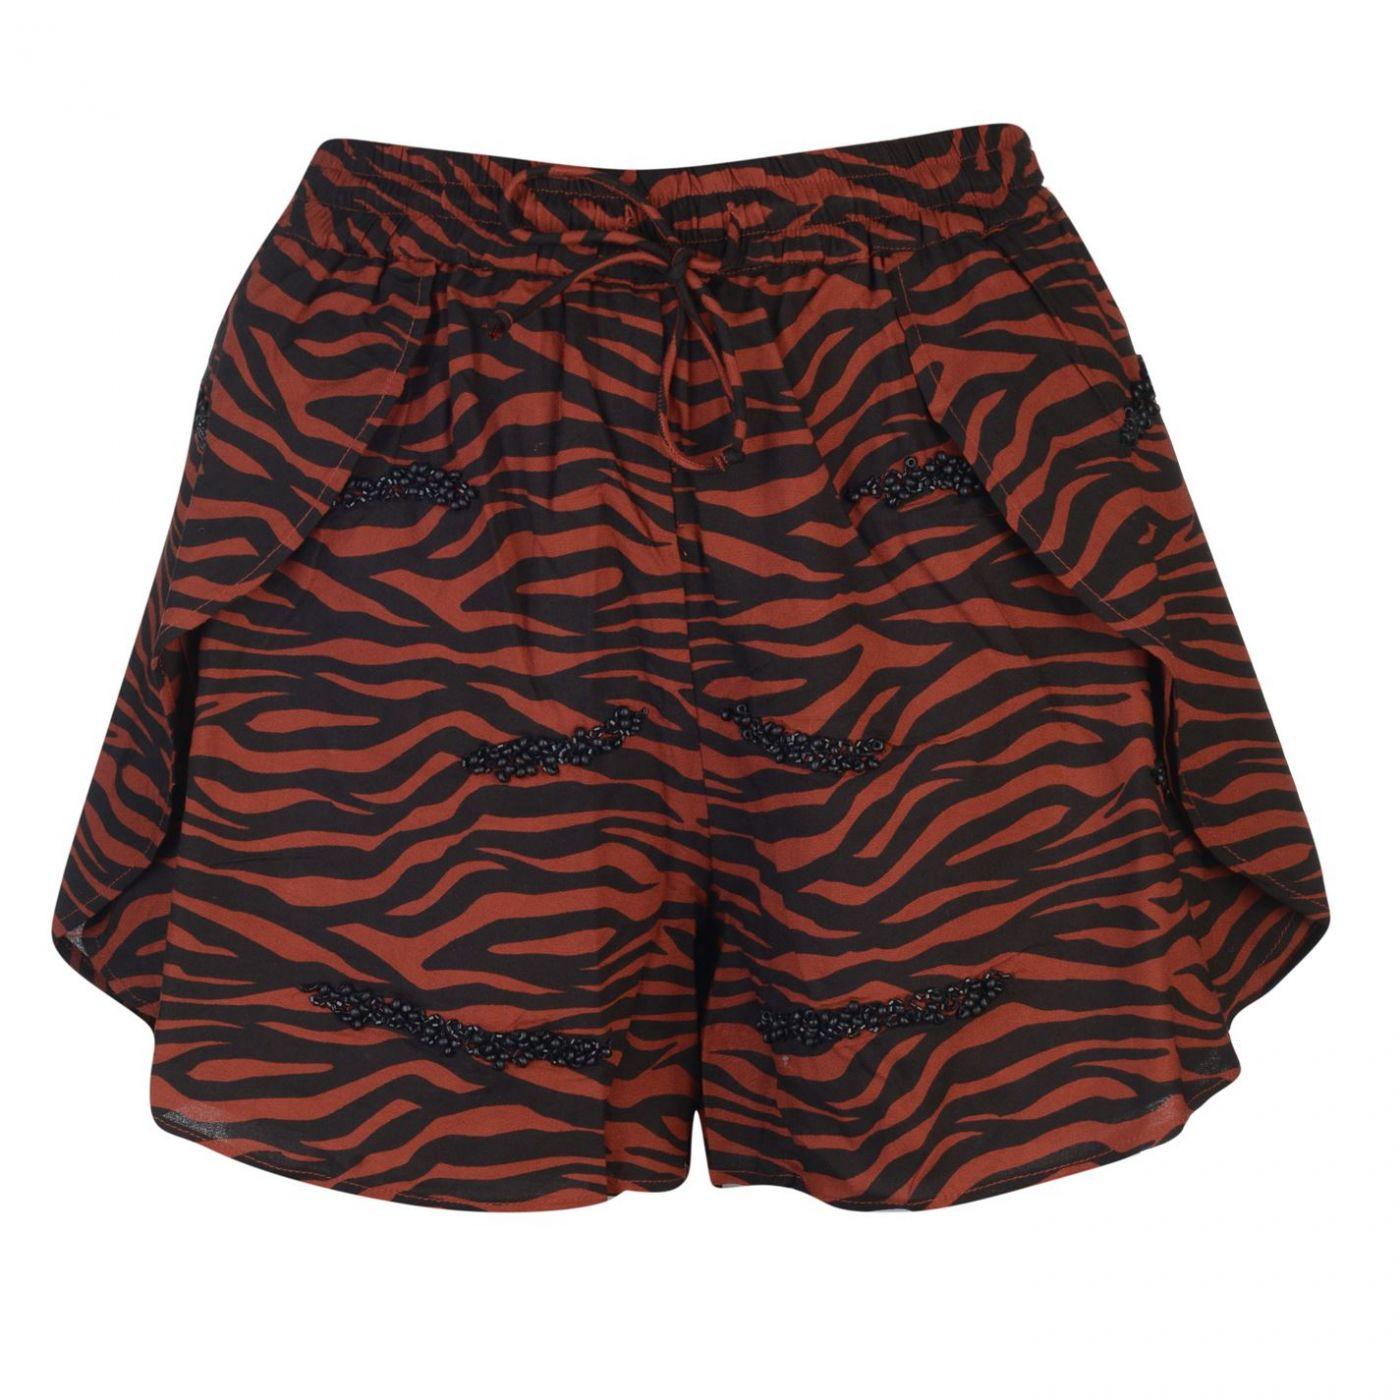 Biba Tiger Beaded Shorts